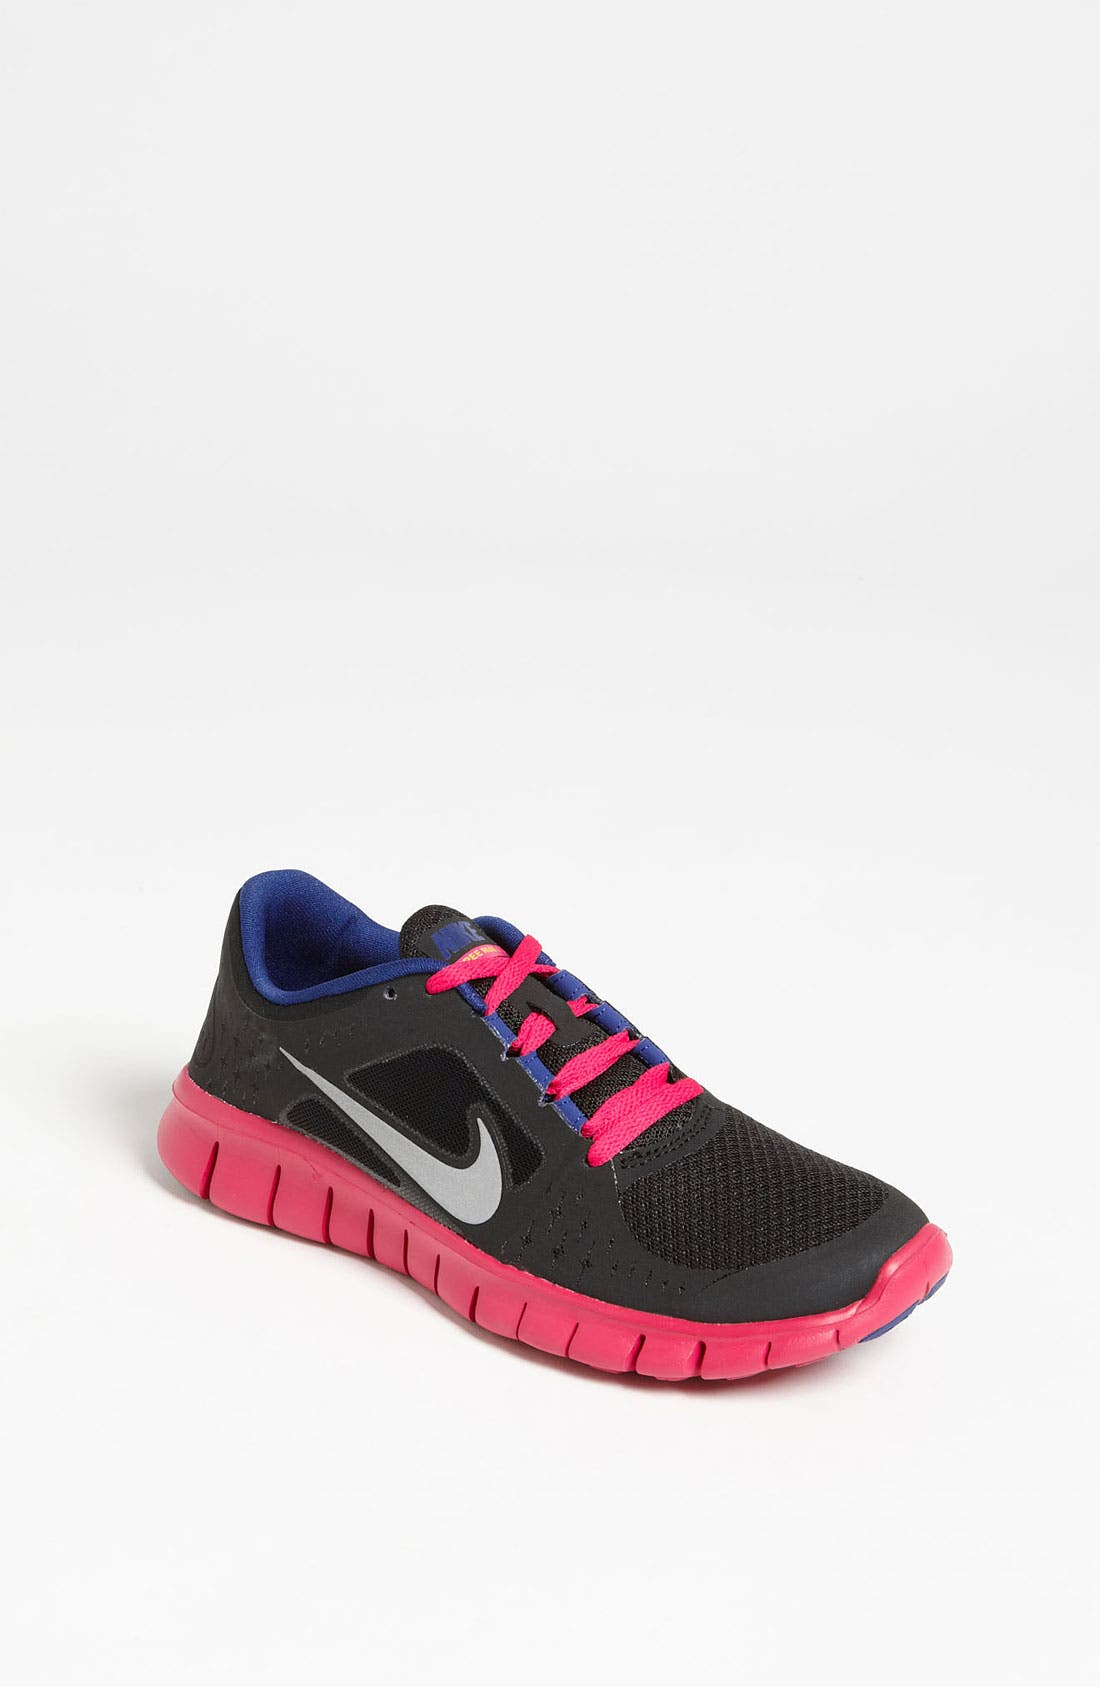 Main Image - Nike 'Free Run 3.0' Running Shoe (Big Kid)